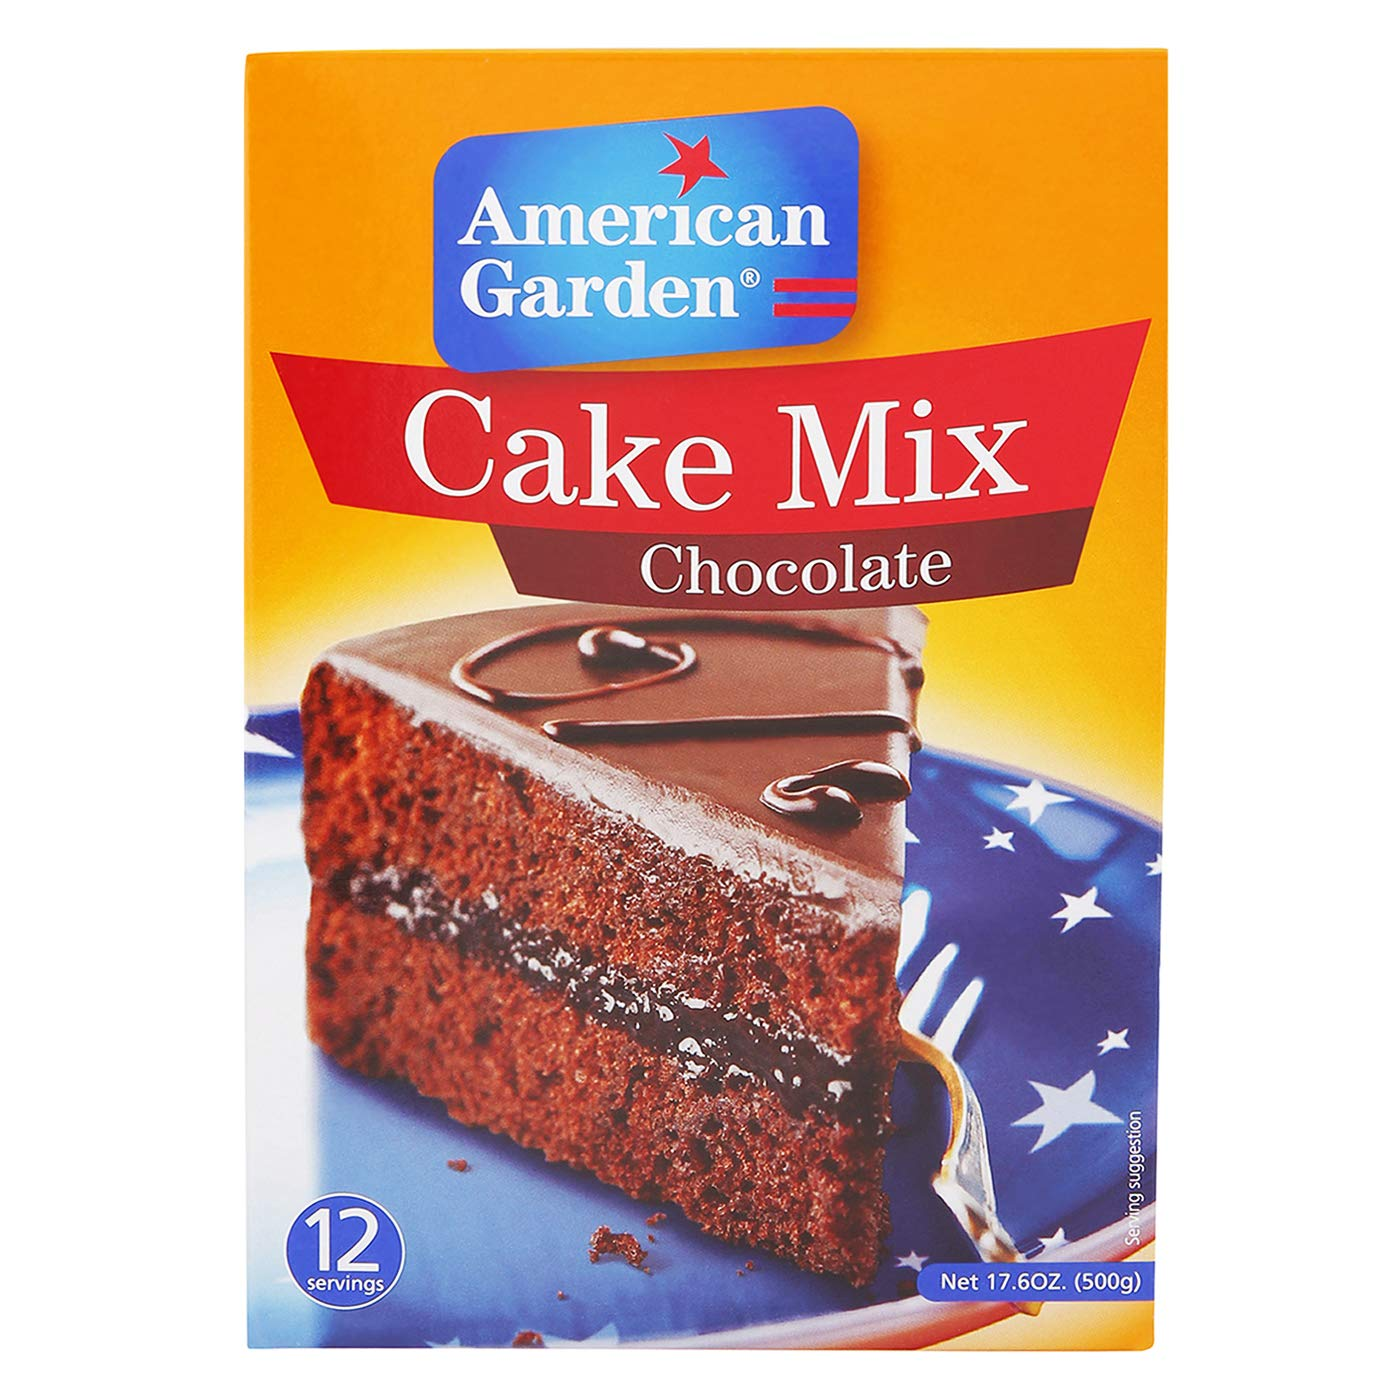 American Garden Cake Mix Chocolate 500g Amazon In Grocery Gourmet Foods